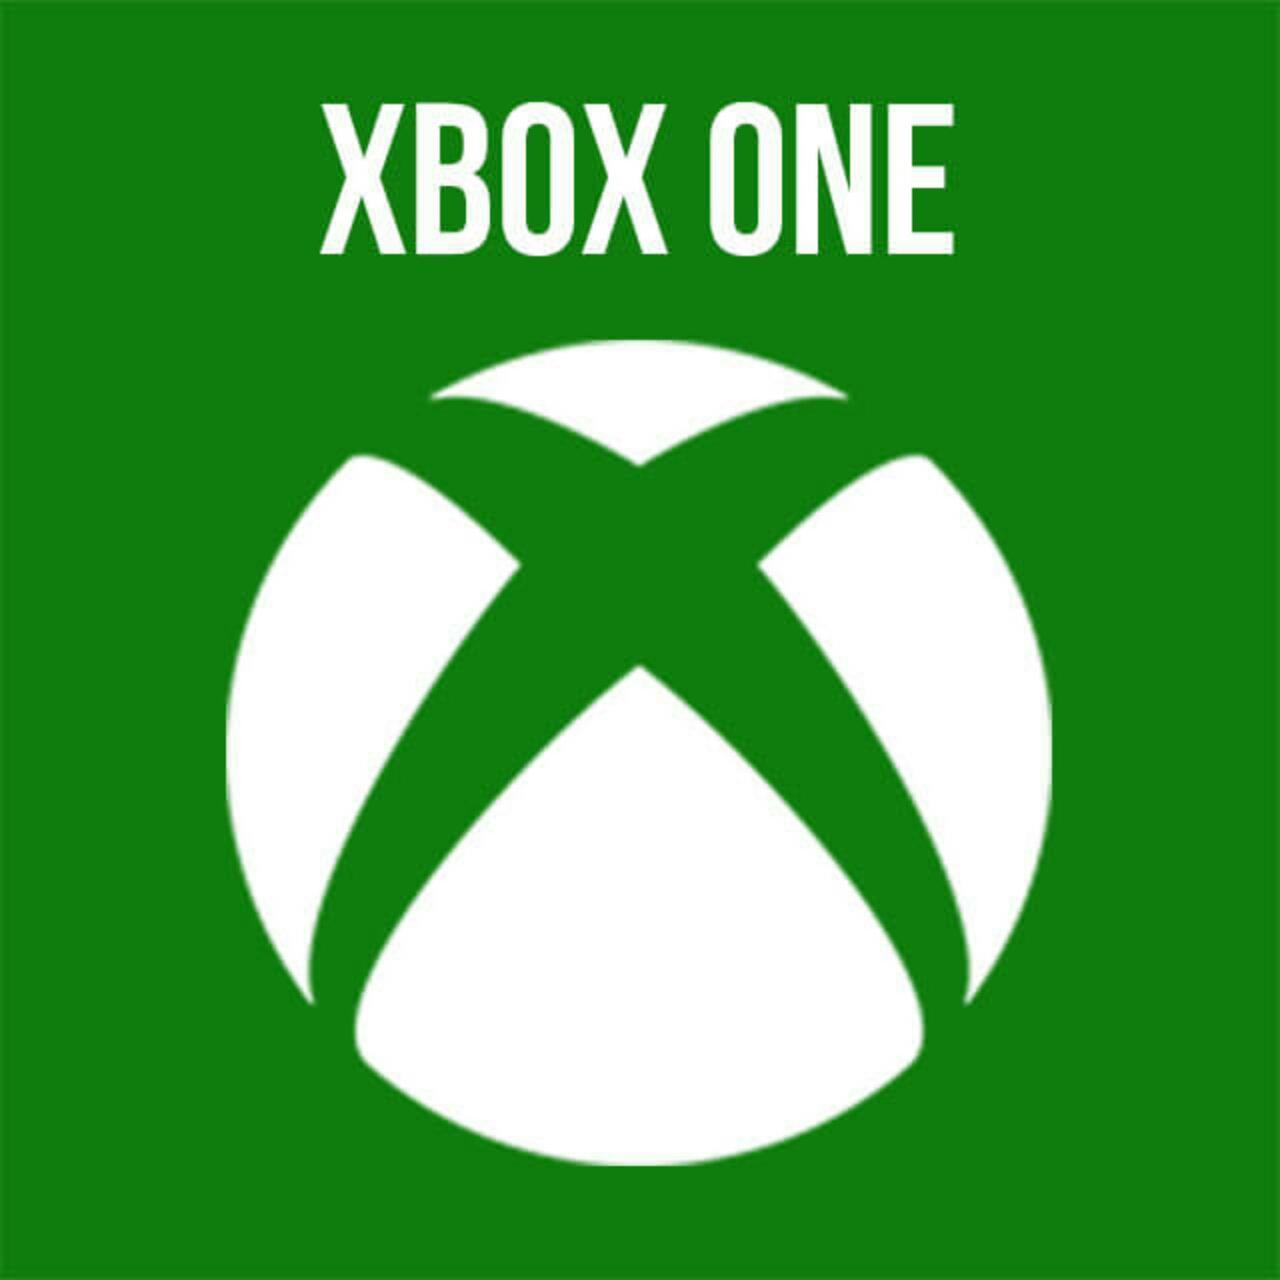 Black Ops 2 UA, Mod Menu, Prestige15, LIFETIME - XBox One Games